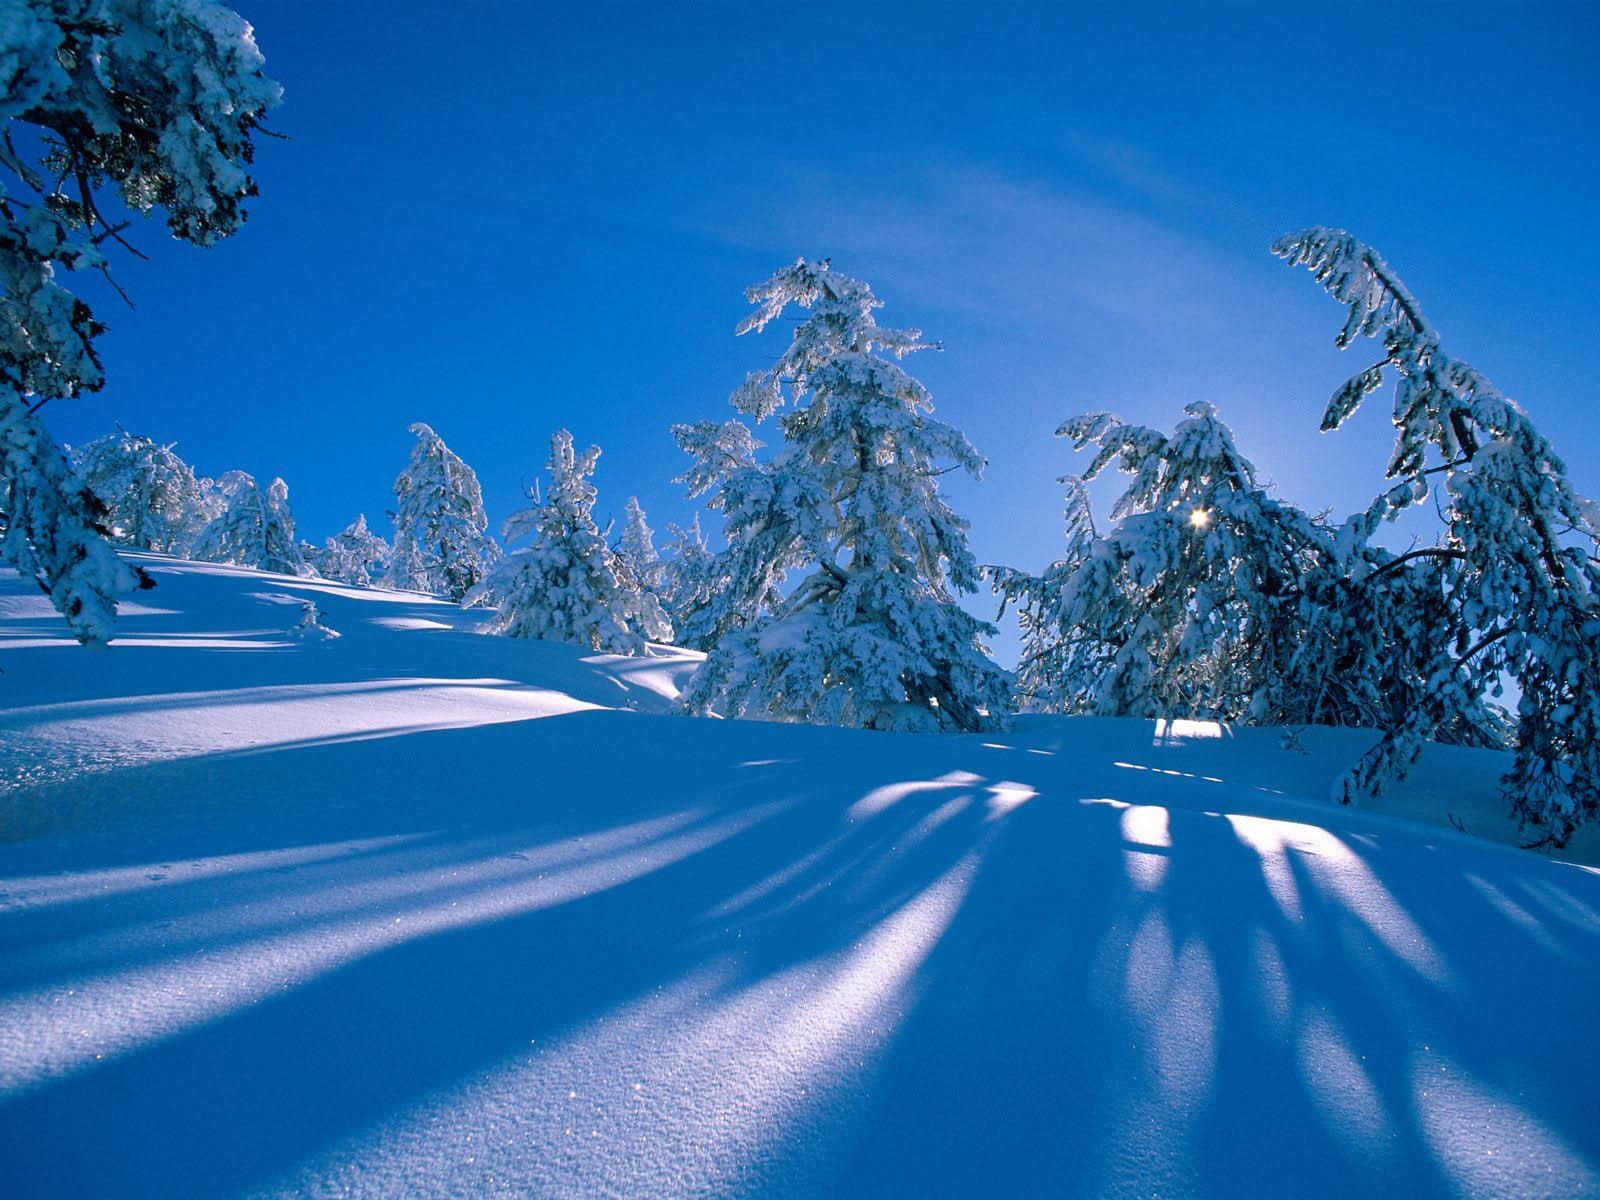 Winter Desktop Backgrounds Winter Photos Winter Pictures Images 1600x1200